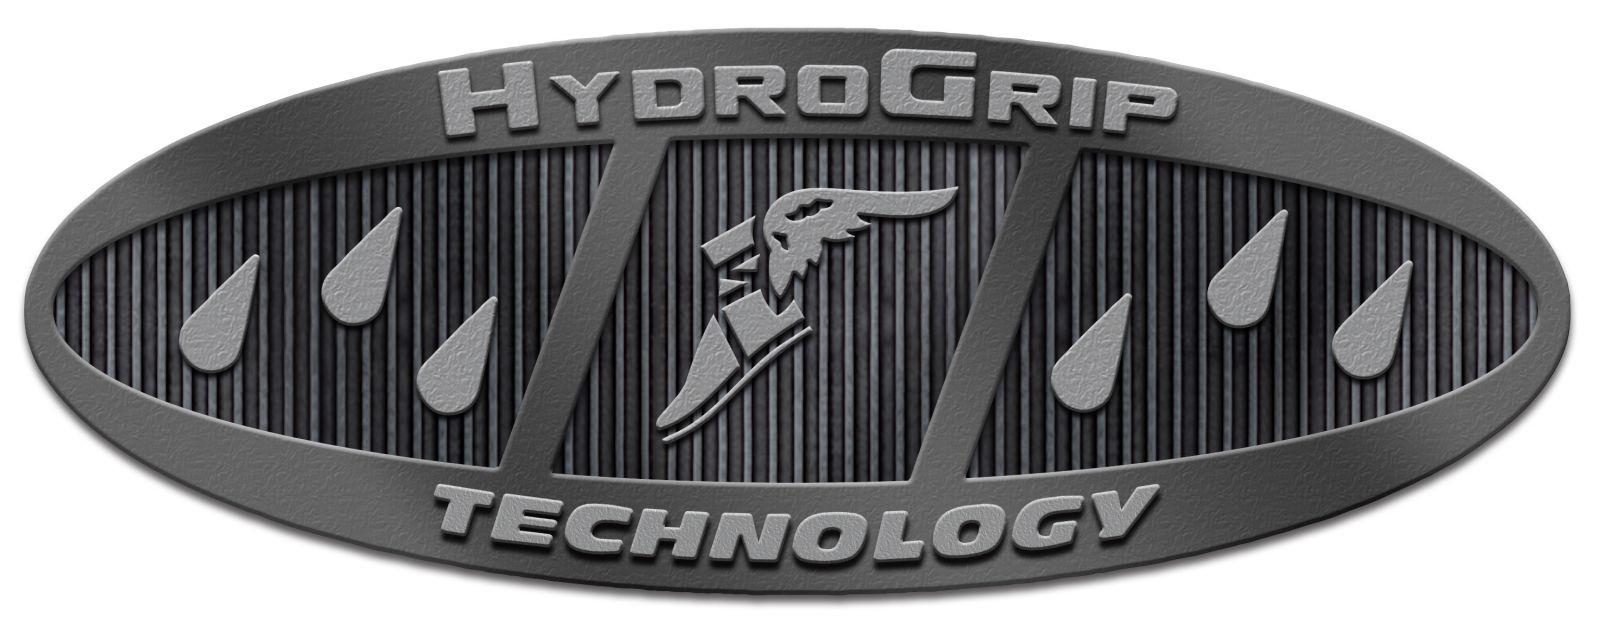 HydroGrip_Technology